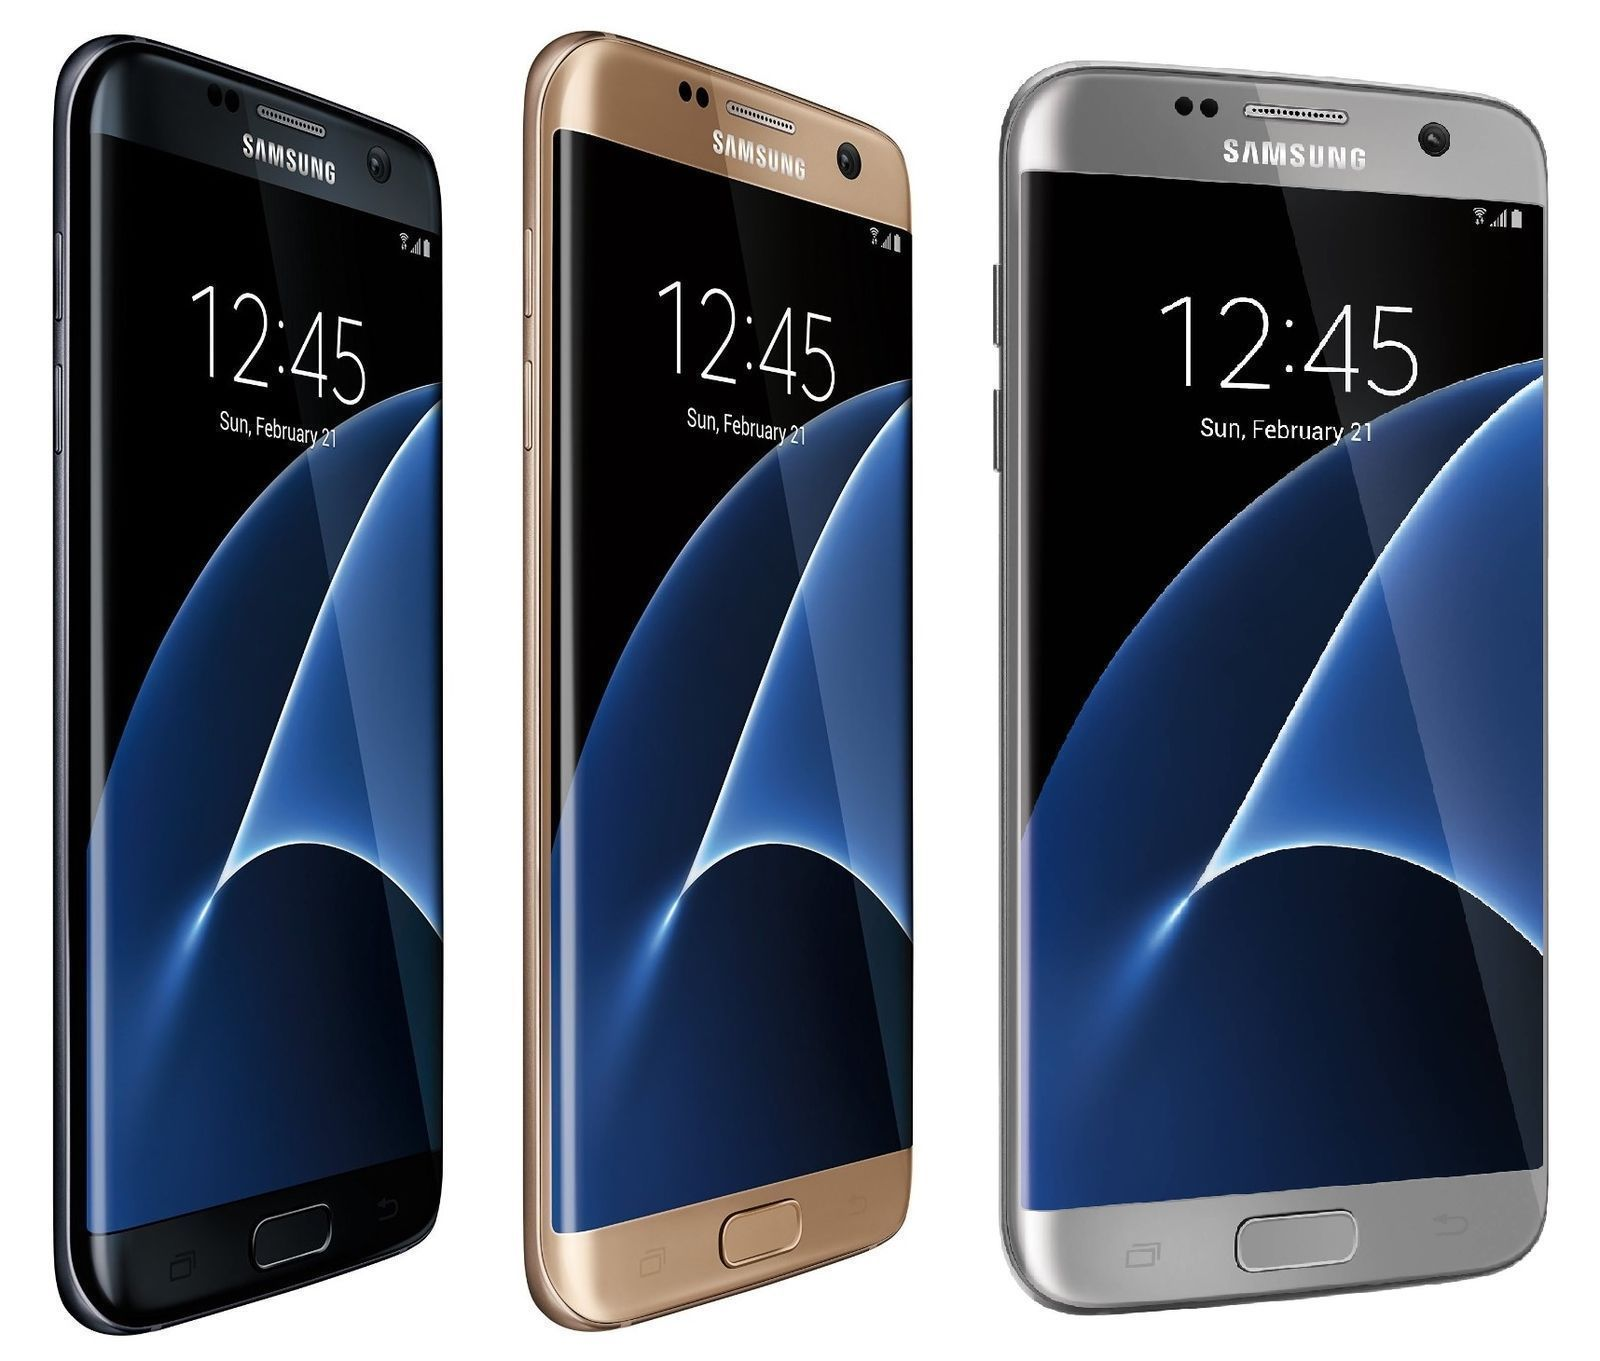 Samsung Galaxy S7 32gb At T T Mobile Gsm Unlocked Smartphone Black Gold Samsung Galaxy Samsung Samsung Galaxy S7 Edge